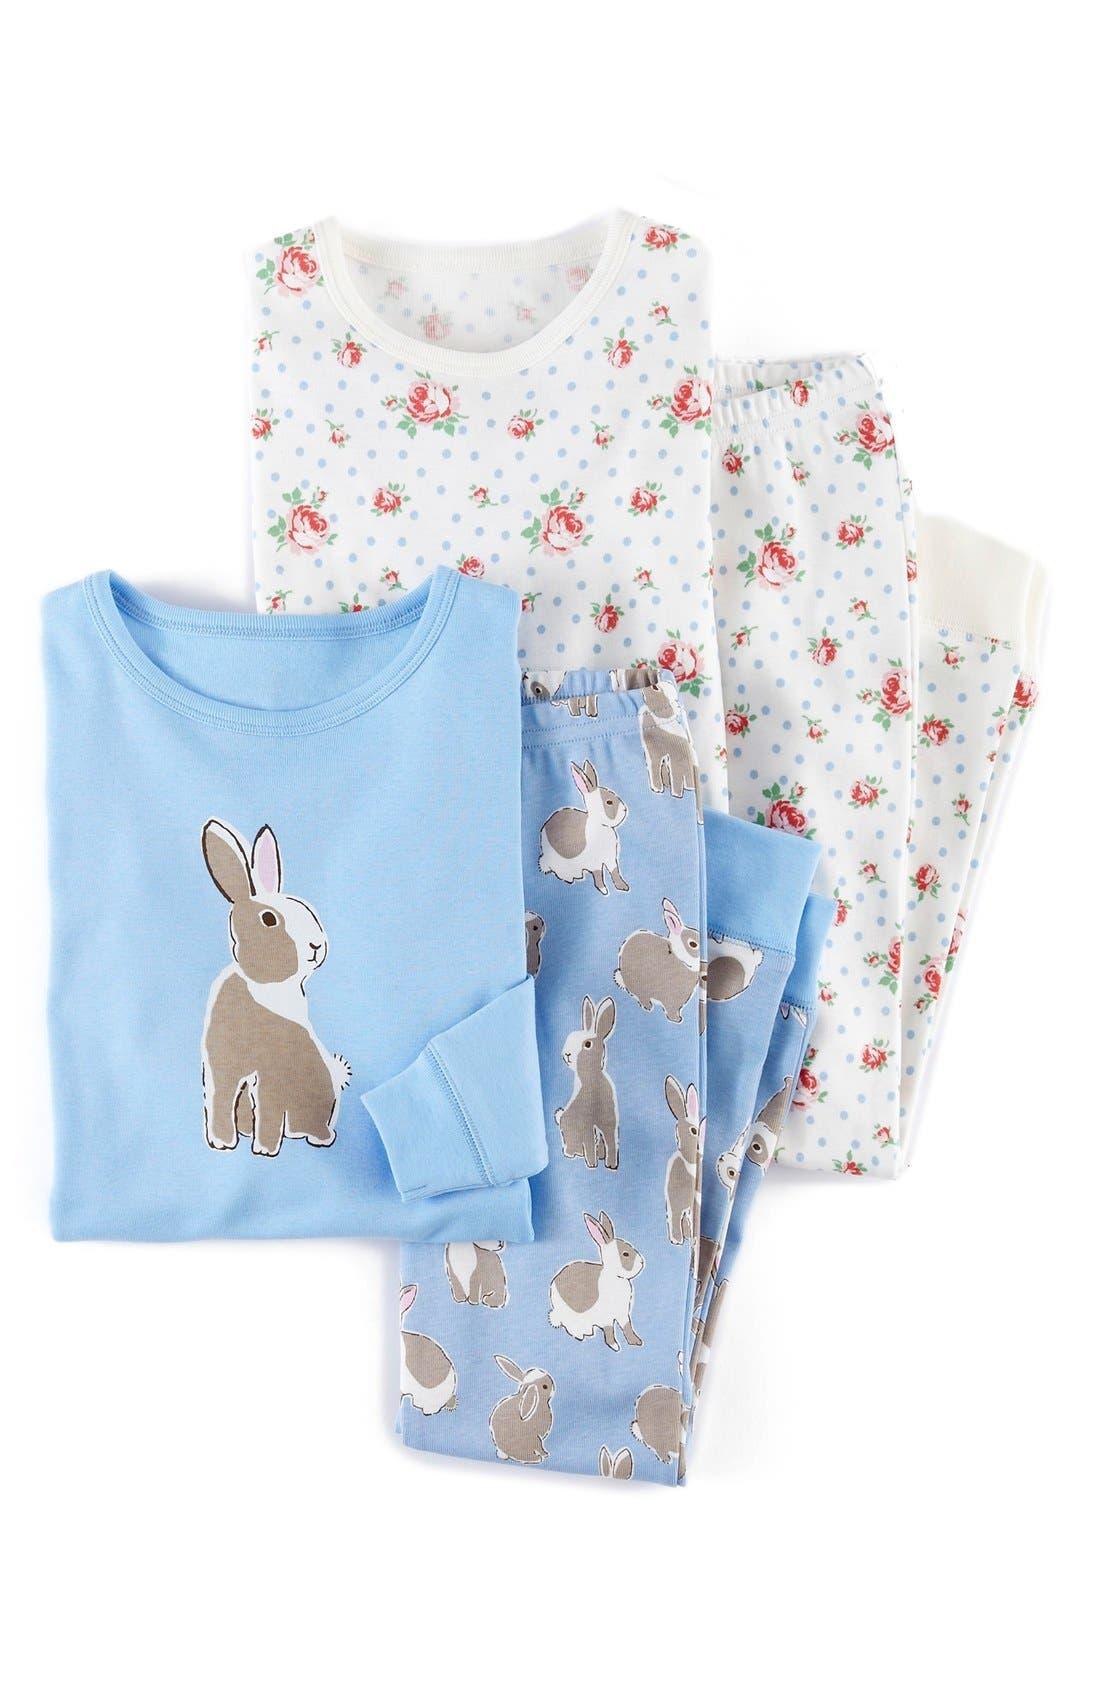 Main Image - Mini Boden Snug Fit Pajamas (2-Pack) (Toddler Girls, Little Girls & Big Girls)